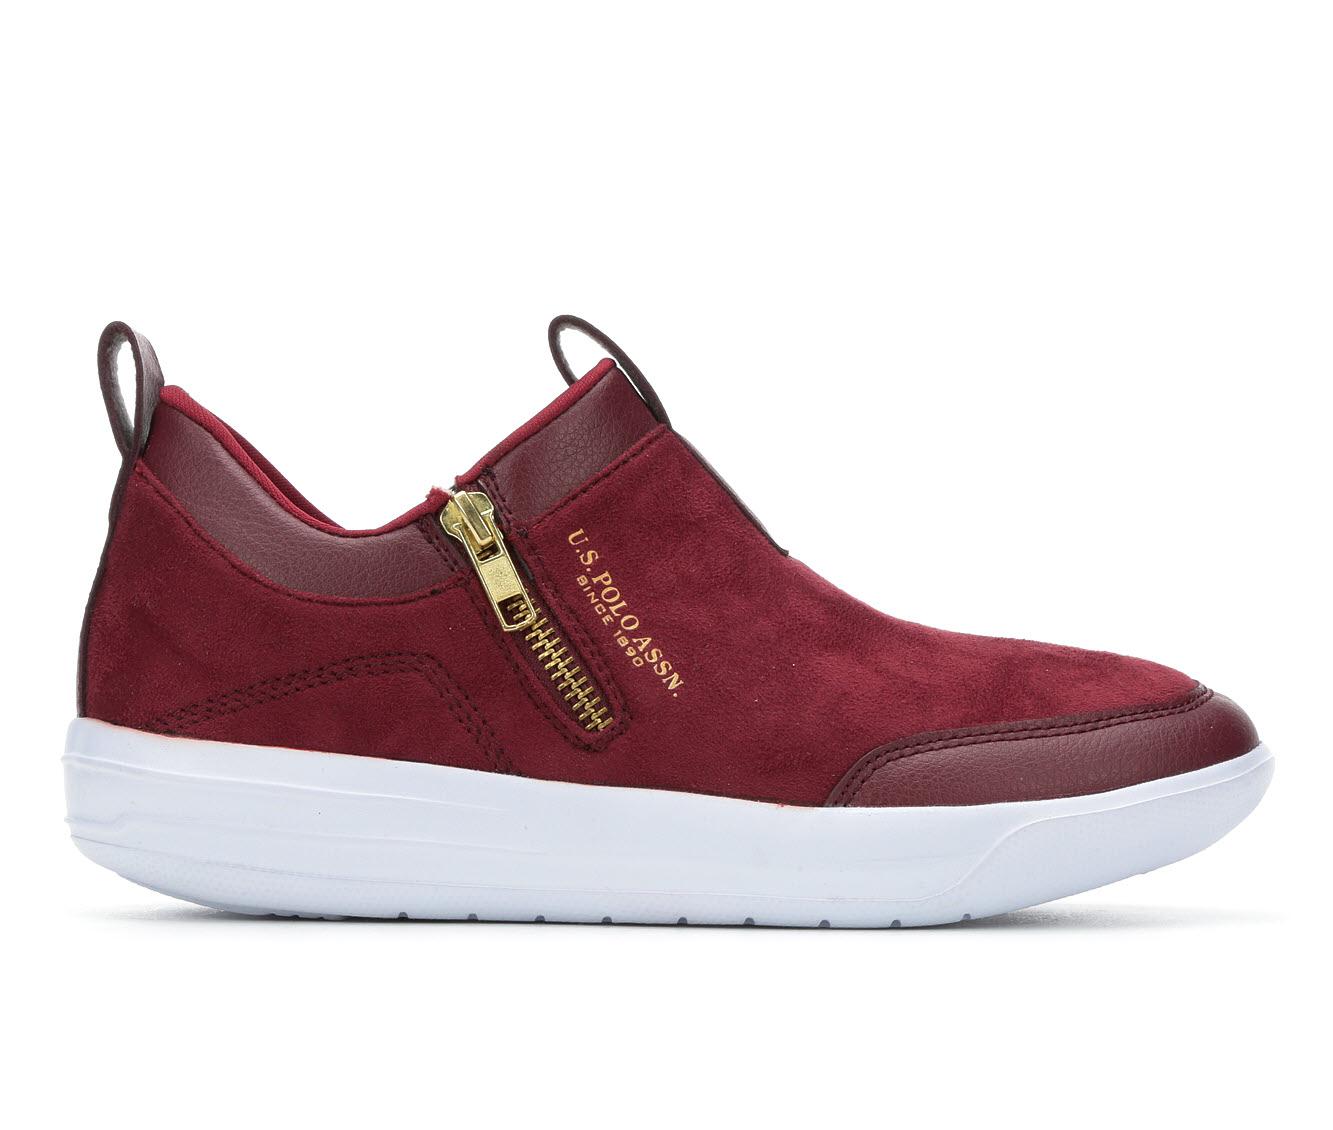 US Polo Assn Mega Women's Shoe (Red Faux Leather)